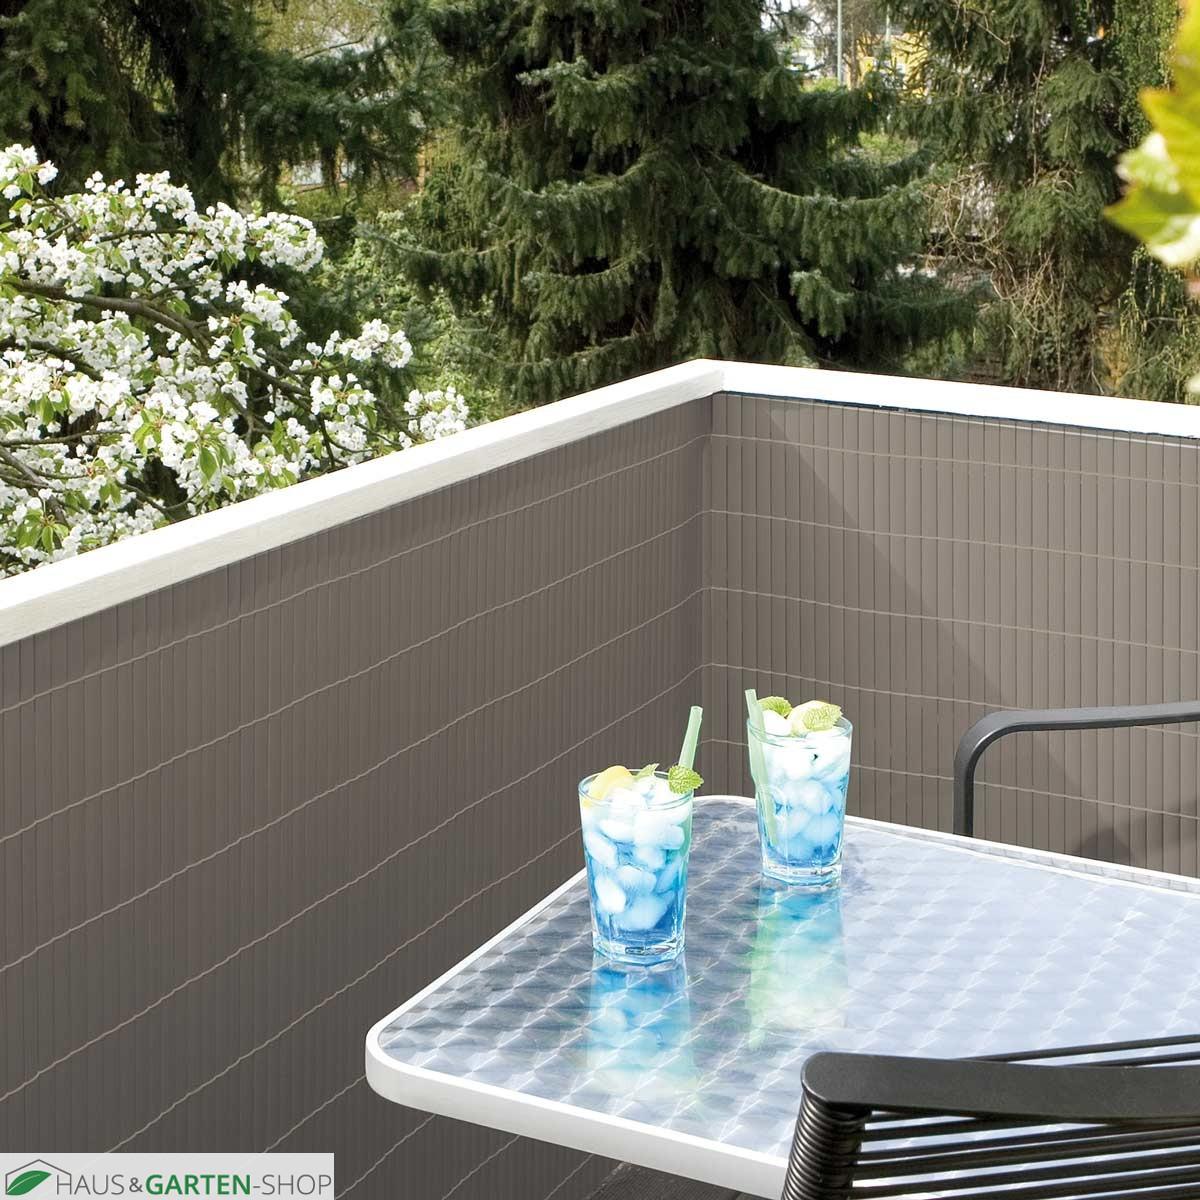 Kunststoffmatte Fur Balkone Farbe Taupe